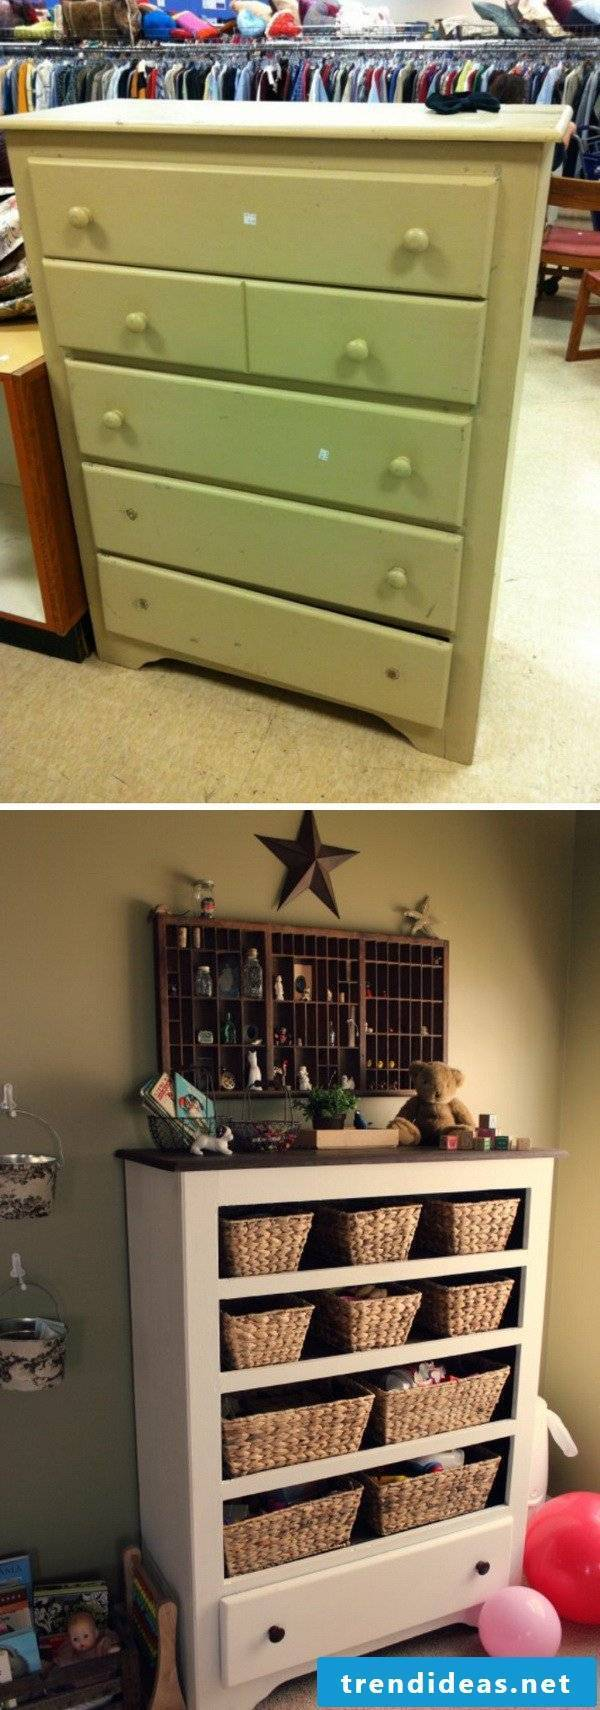 Pimp Hacks: Do It Yourself Ideas for DIY Cabinet